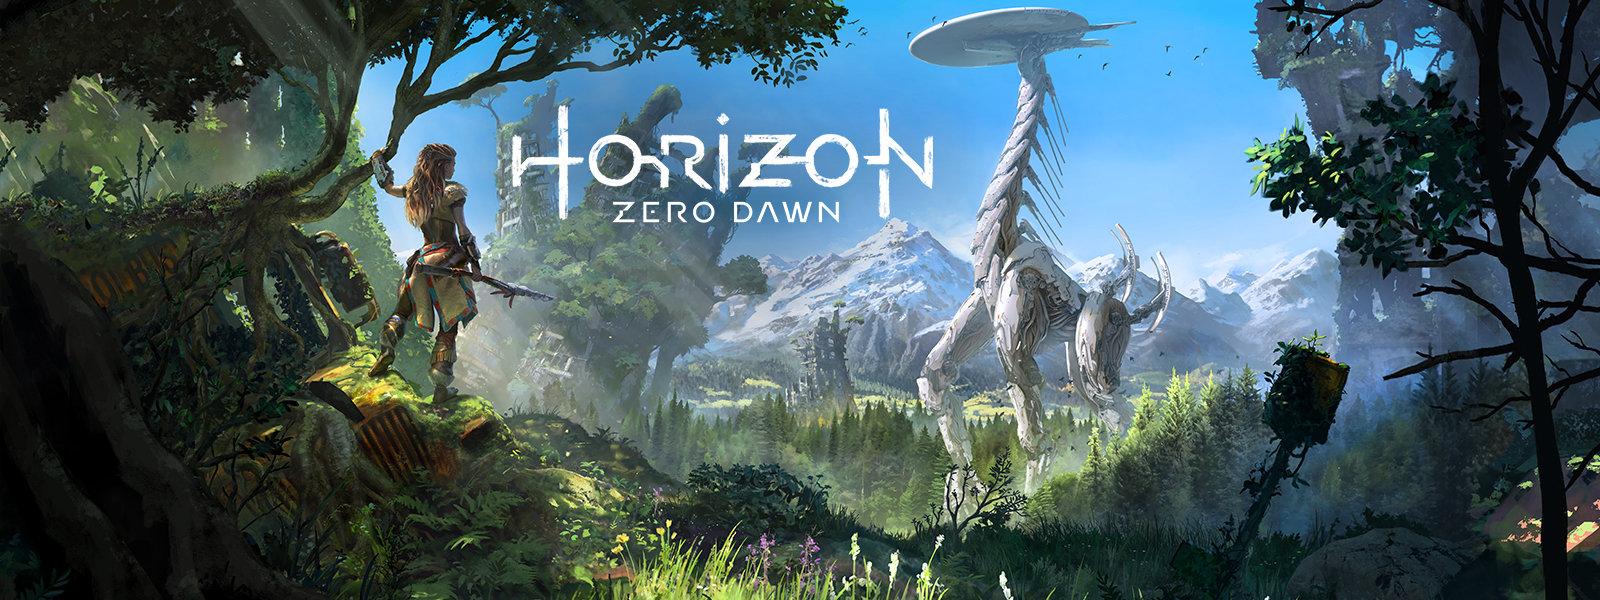 Programa 10x24 (28-04-2017) 'Horizon Zero Dawn'  Horizon-zero-dawn-normalbanner-us-15jun15